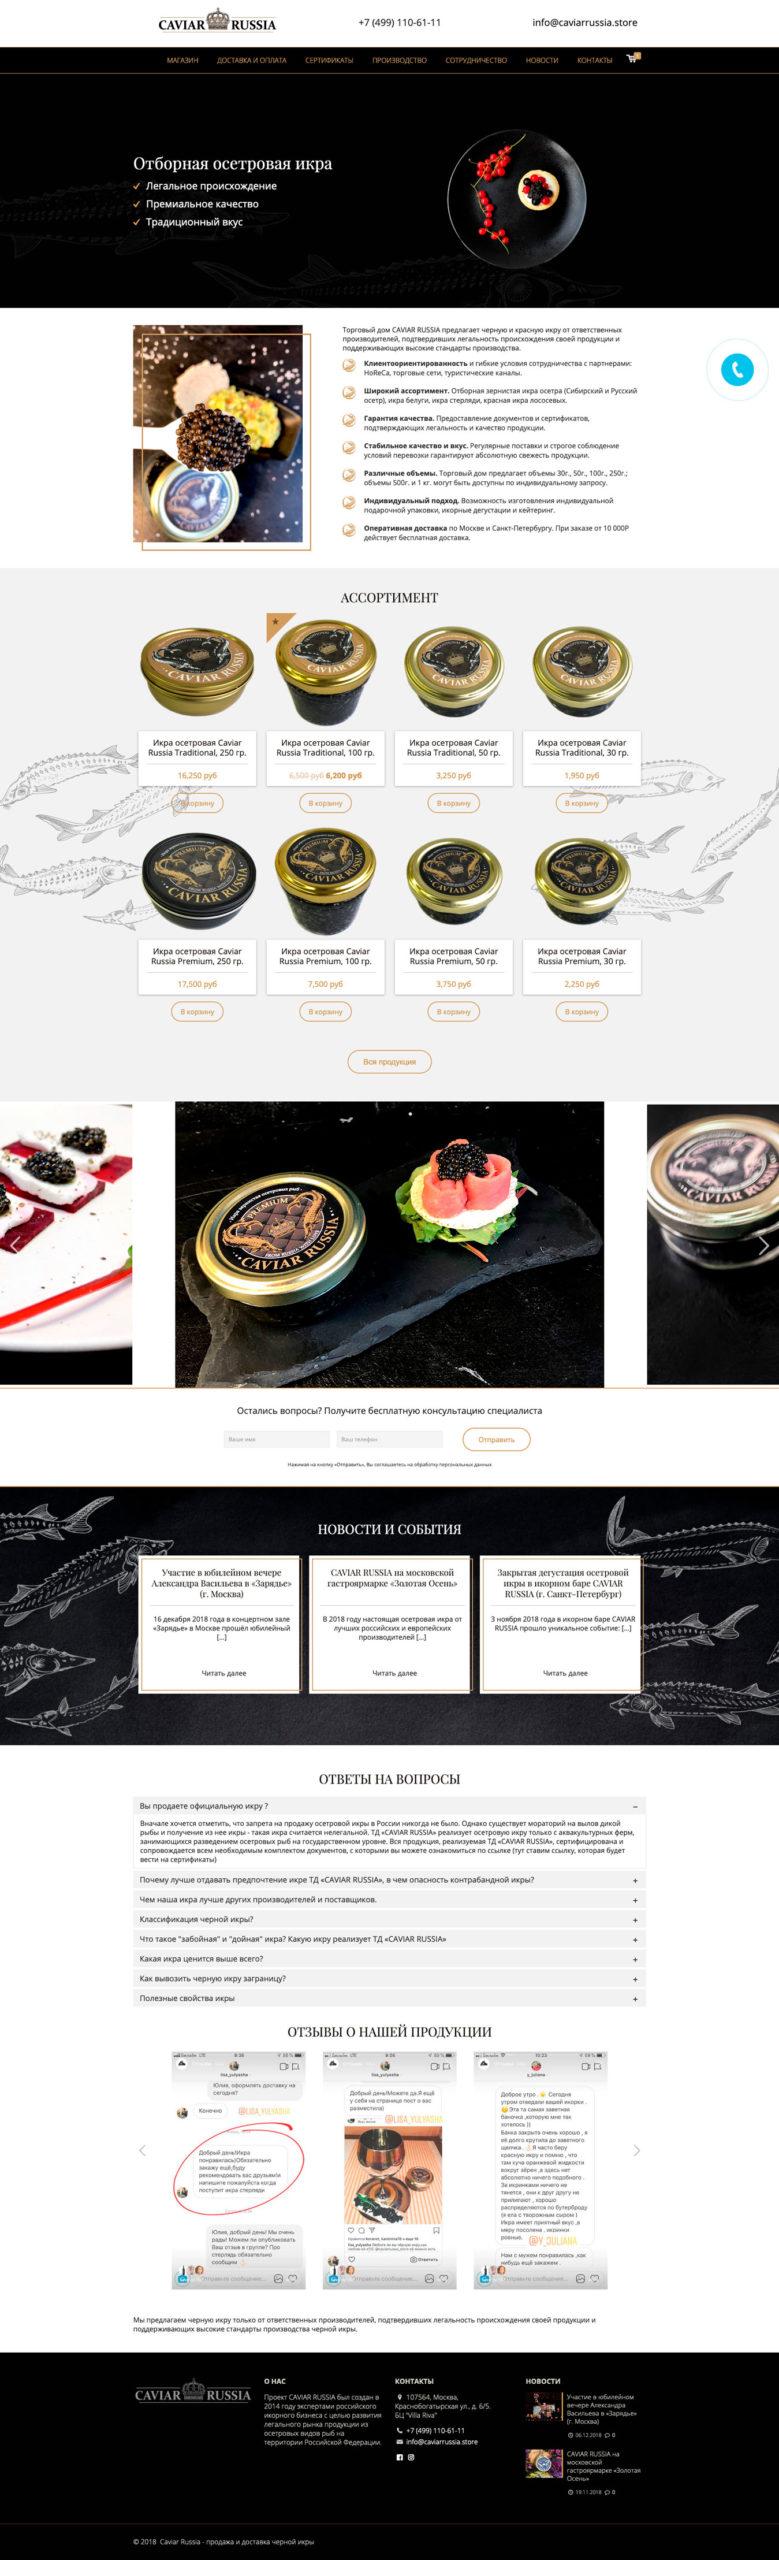 Сайт компании CAVIAR RUSSIA